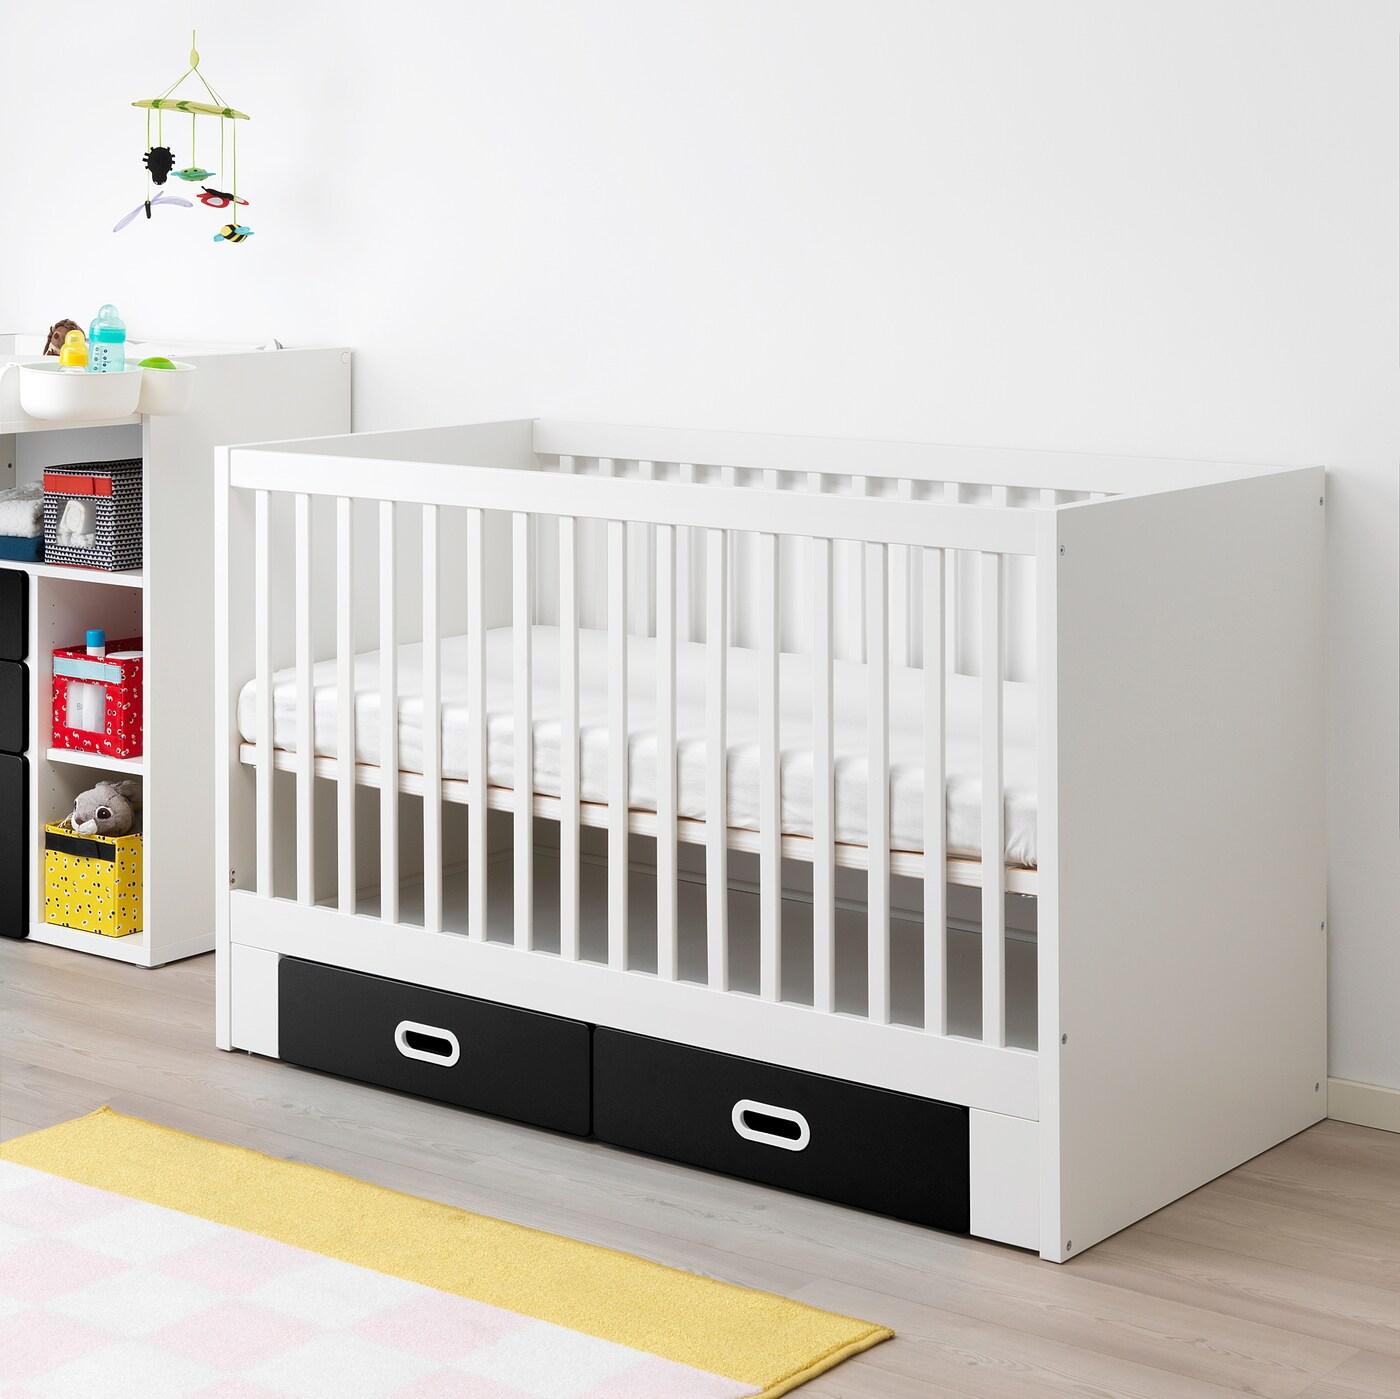 STUVA / FRITIDS Babybett mit Schubfächern Kreidetafeloberfläche 146 cm 74 cm 92 cm 70 cm 140 cm 20 kg